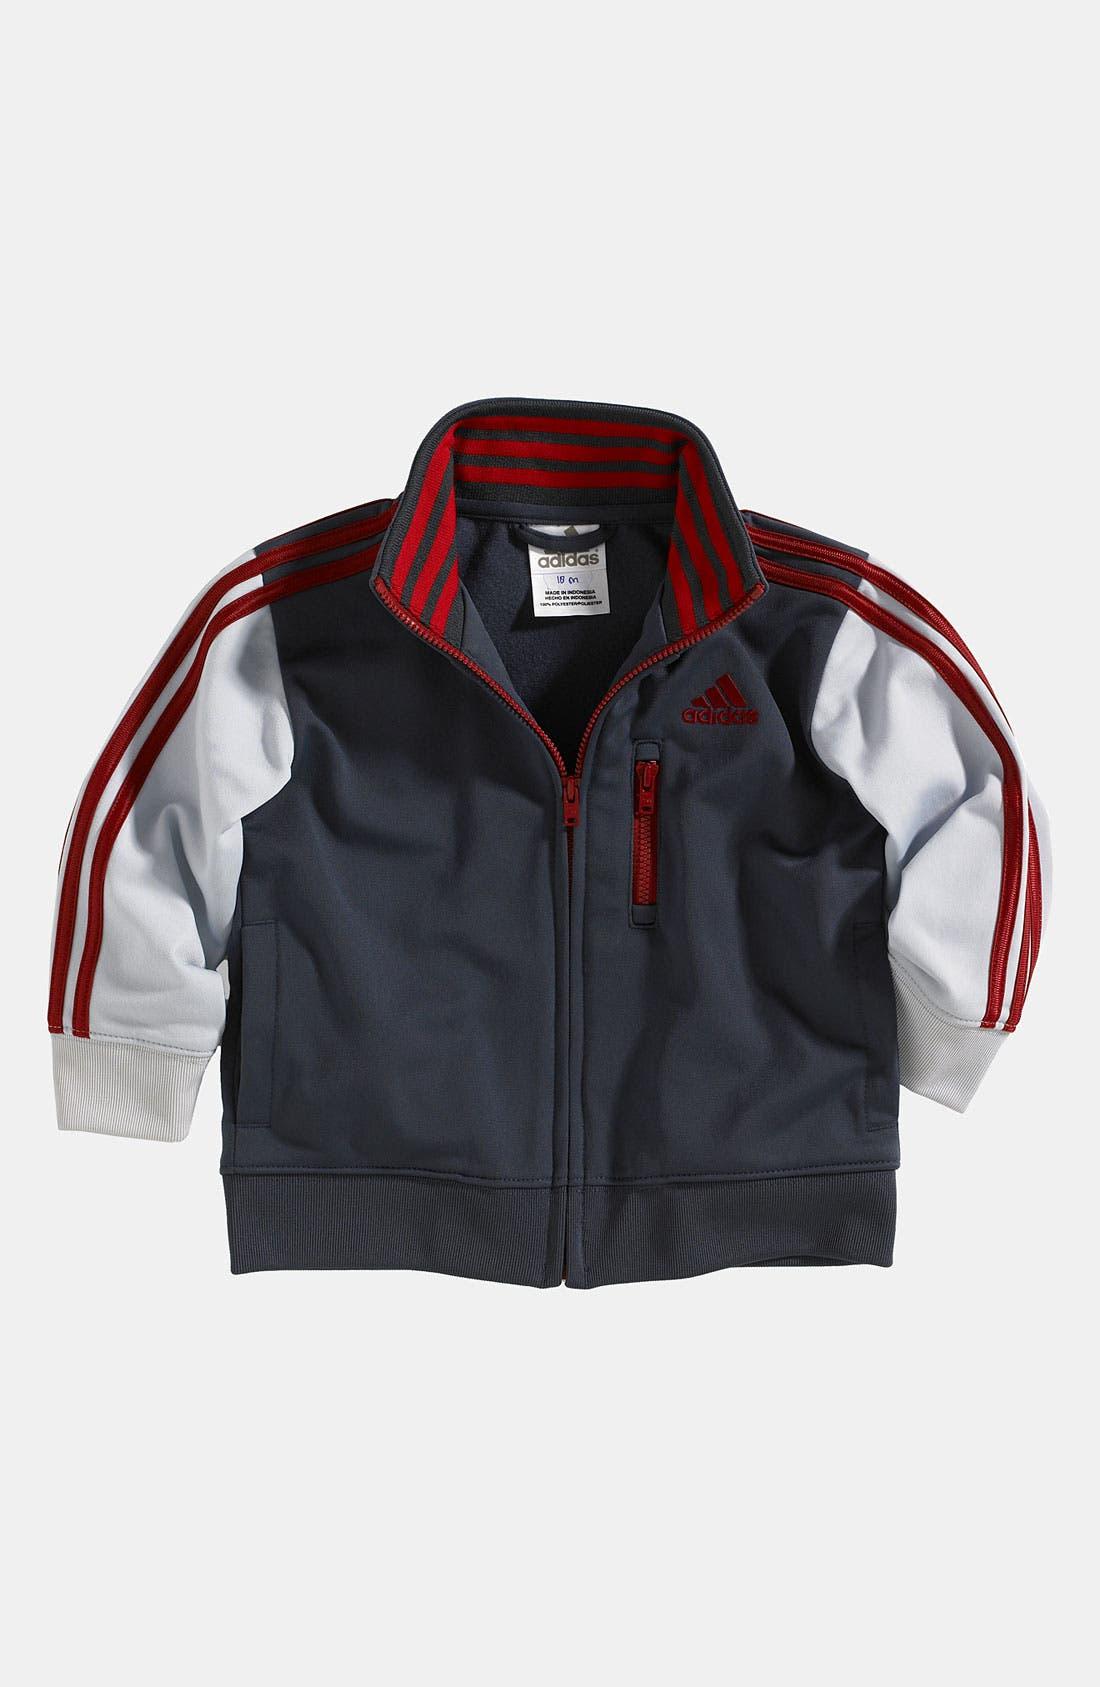 Alternate Image 1 Selected - adidas 'Varsity' Jacket (Toddler)